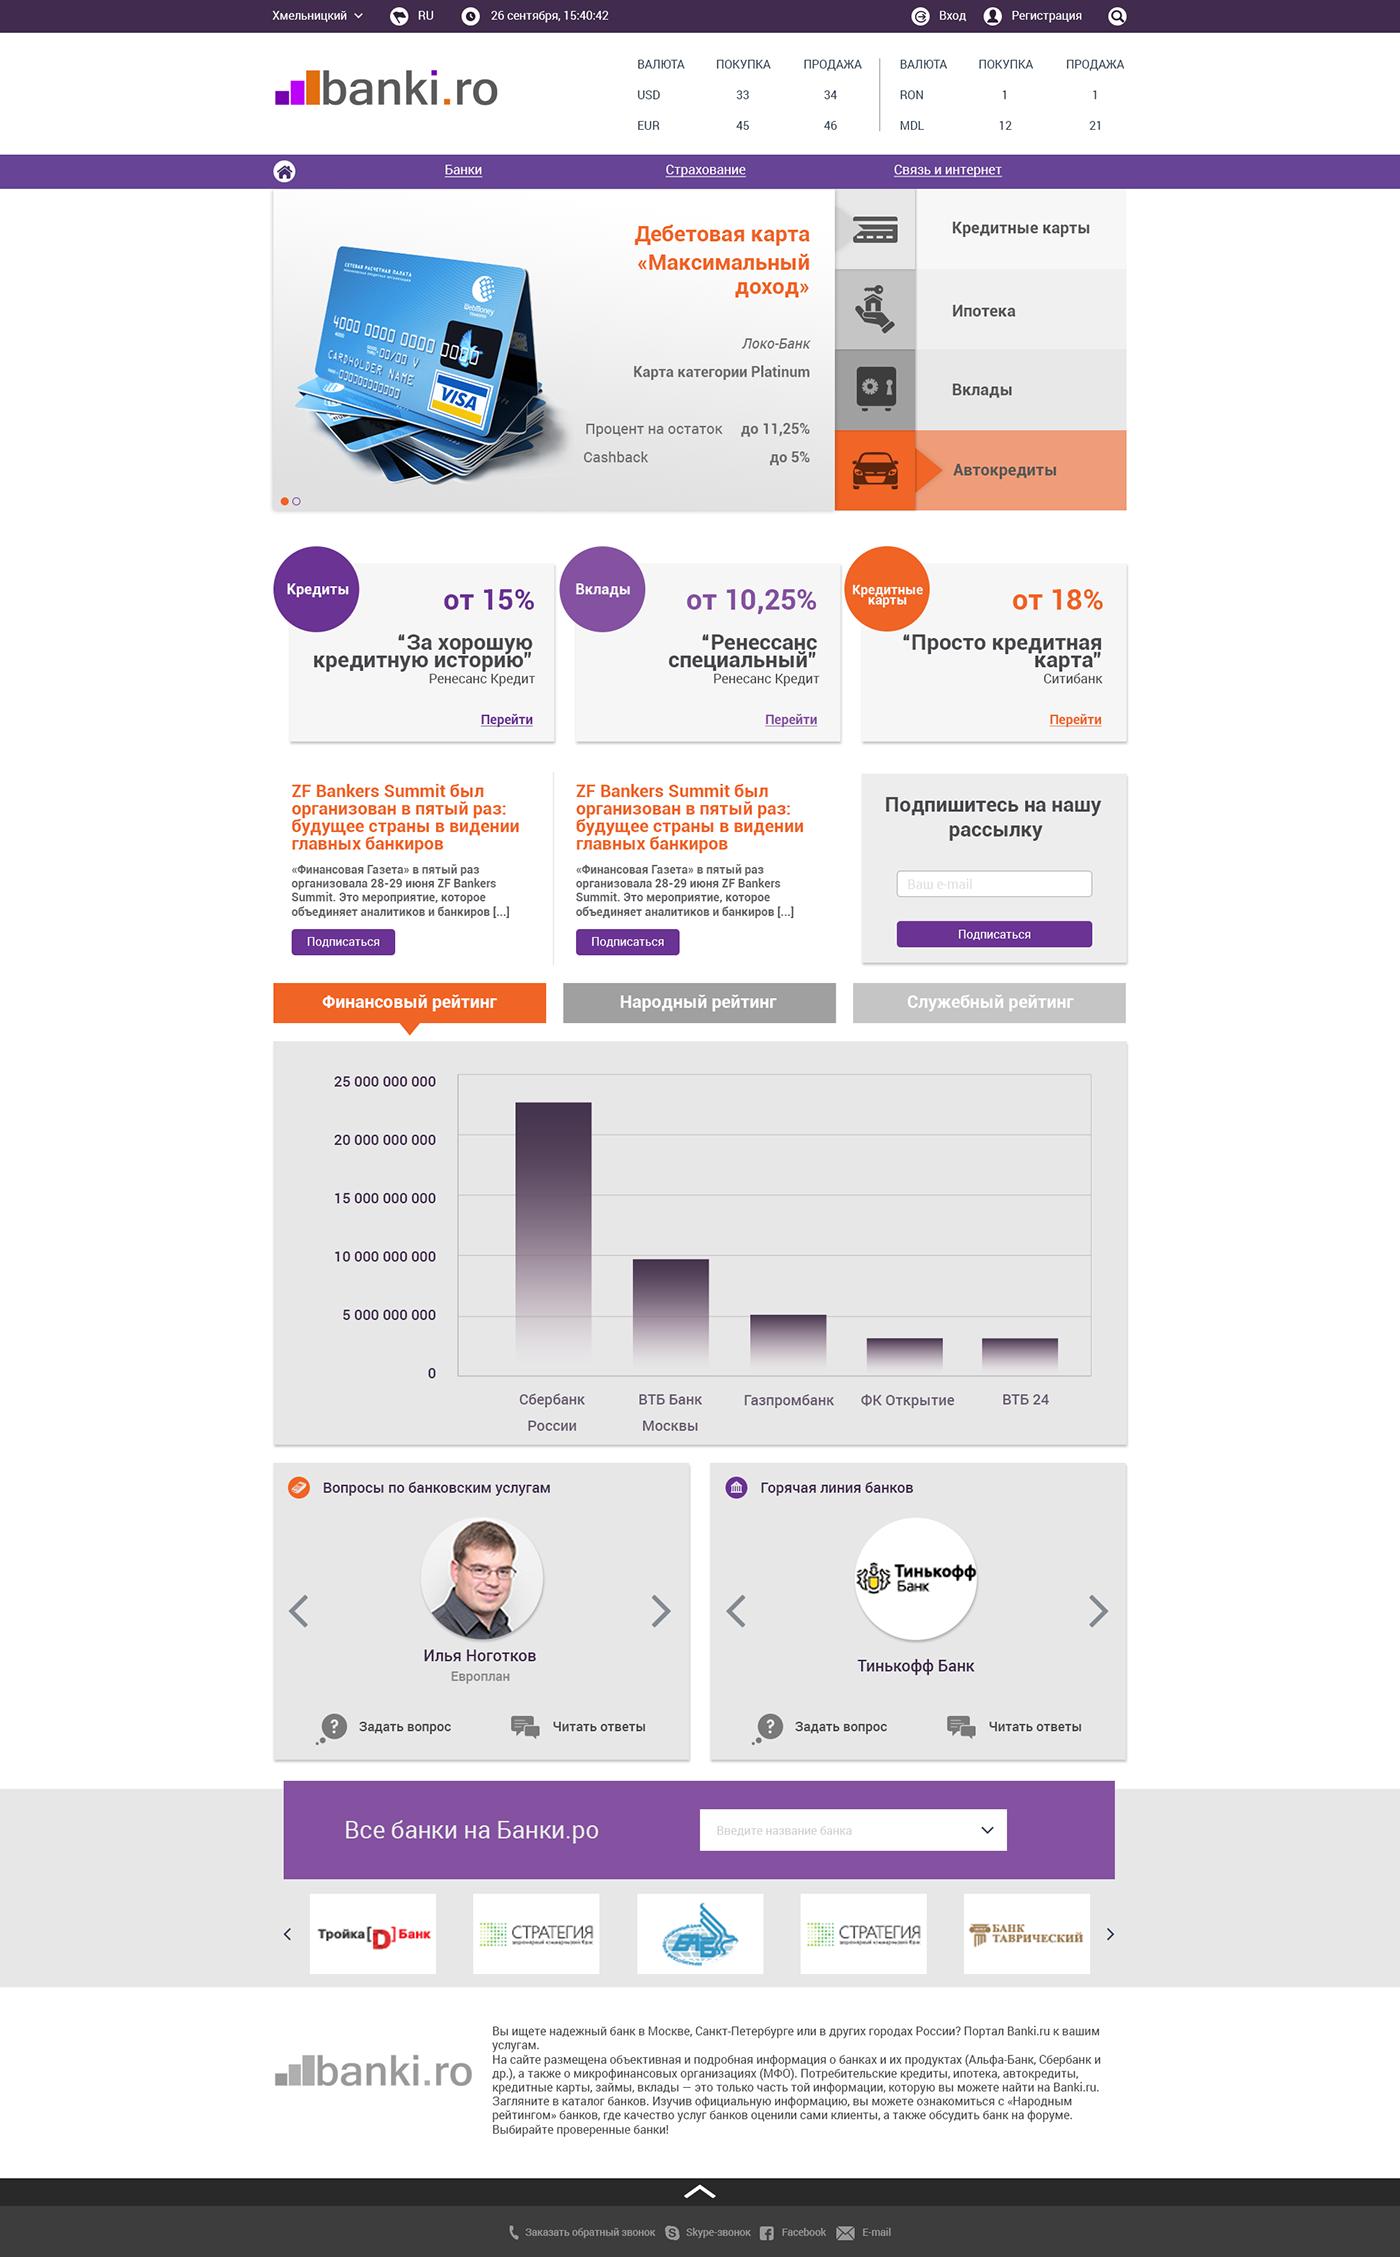 Дизайн сайта услуг